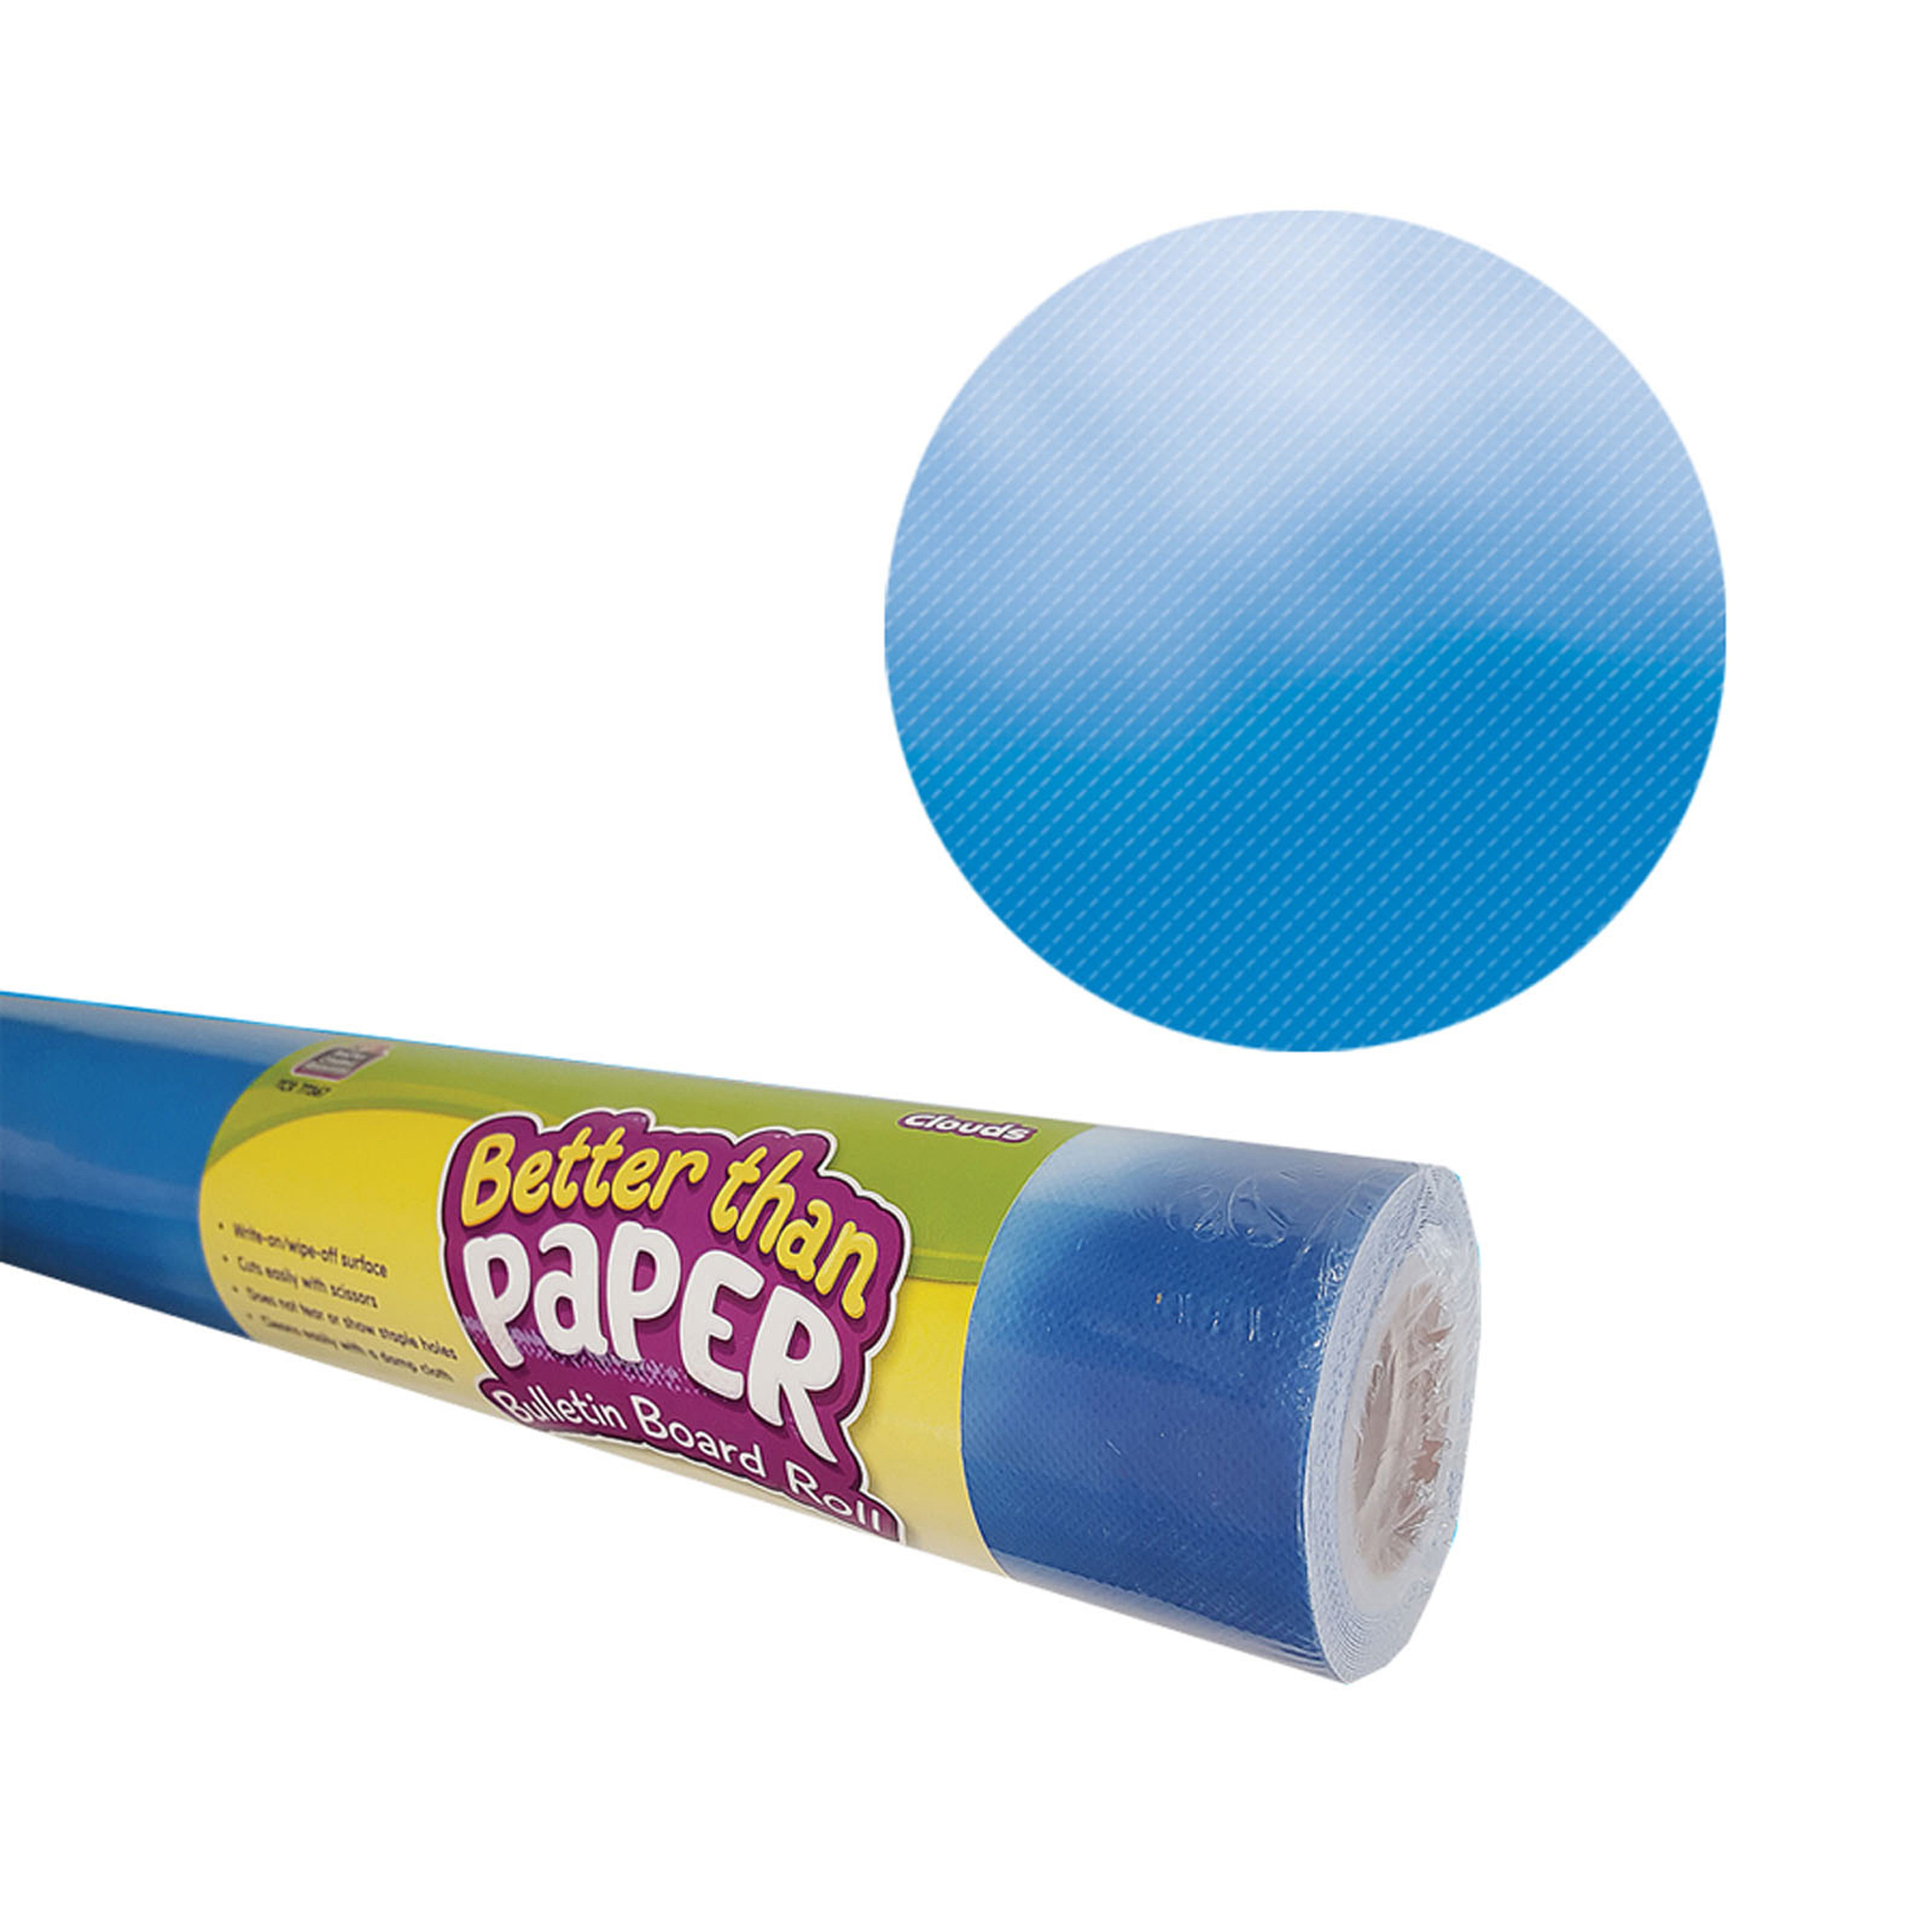 Better Than Paper Bulletin Board Roll, 4' x 12', Clouds, 4 Rolls